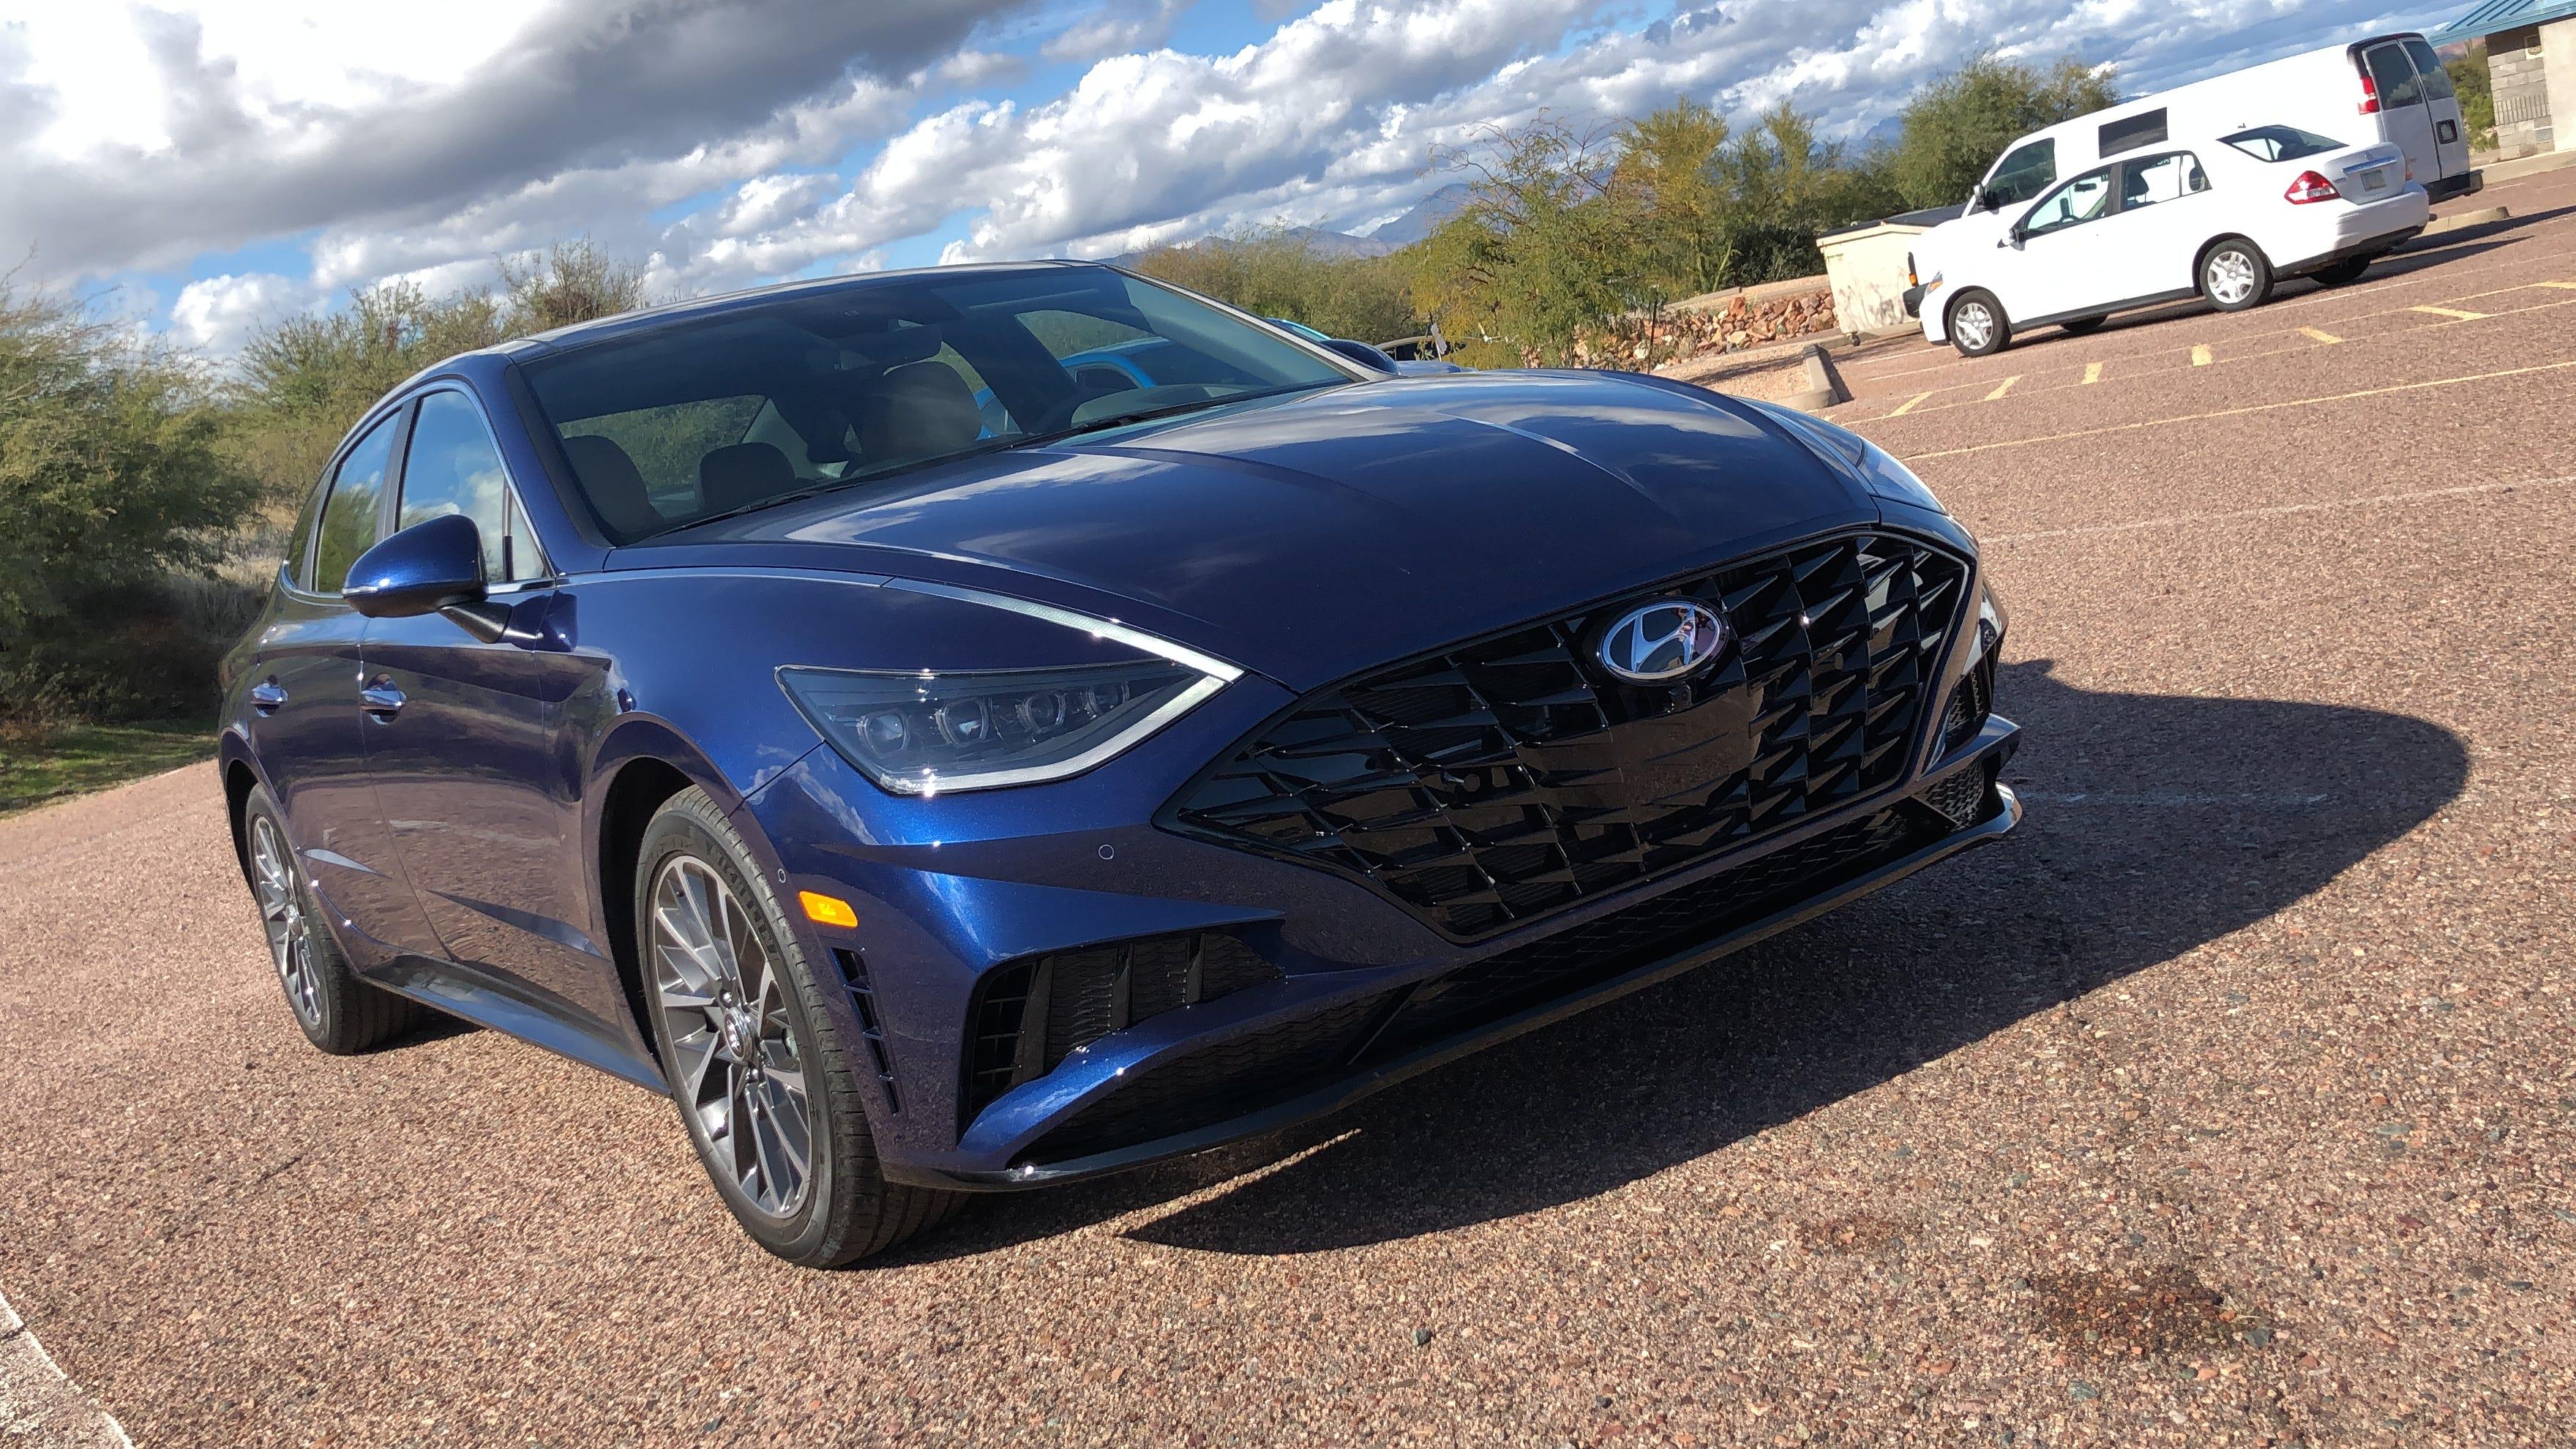 2020 Hyundai Sonata Takes The Lead In Sedan Race With